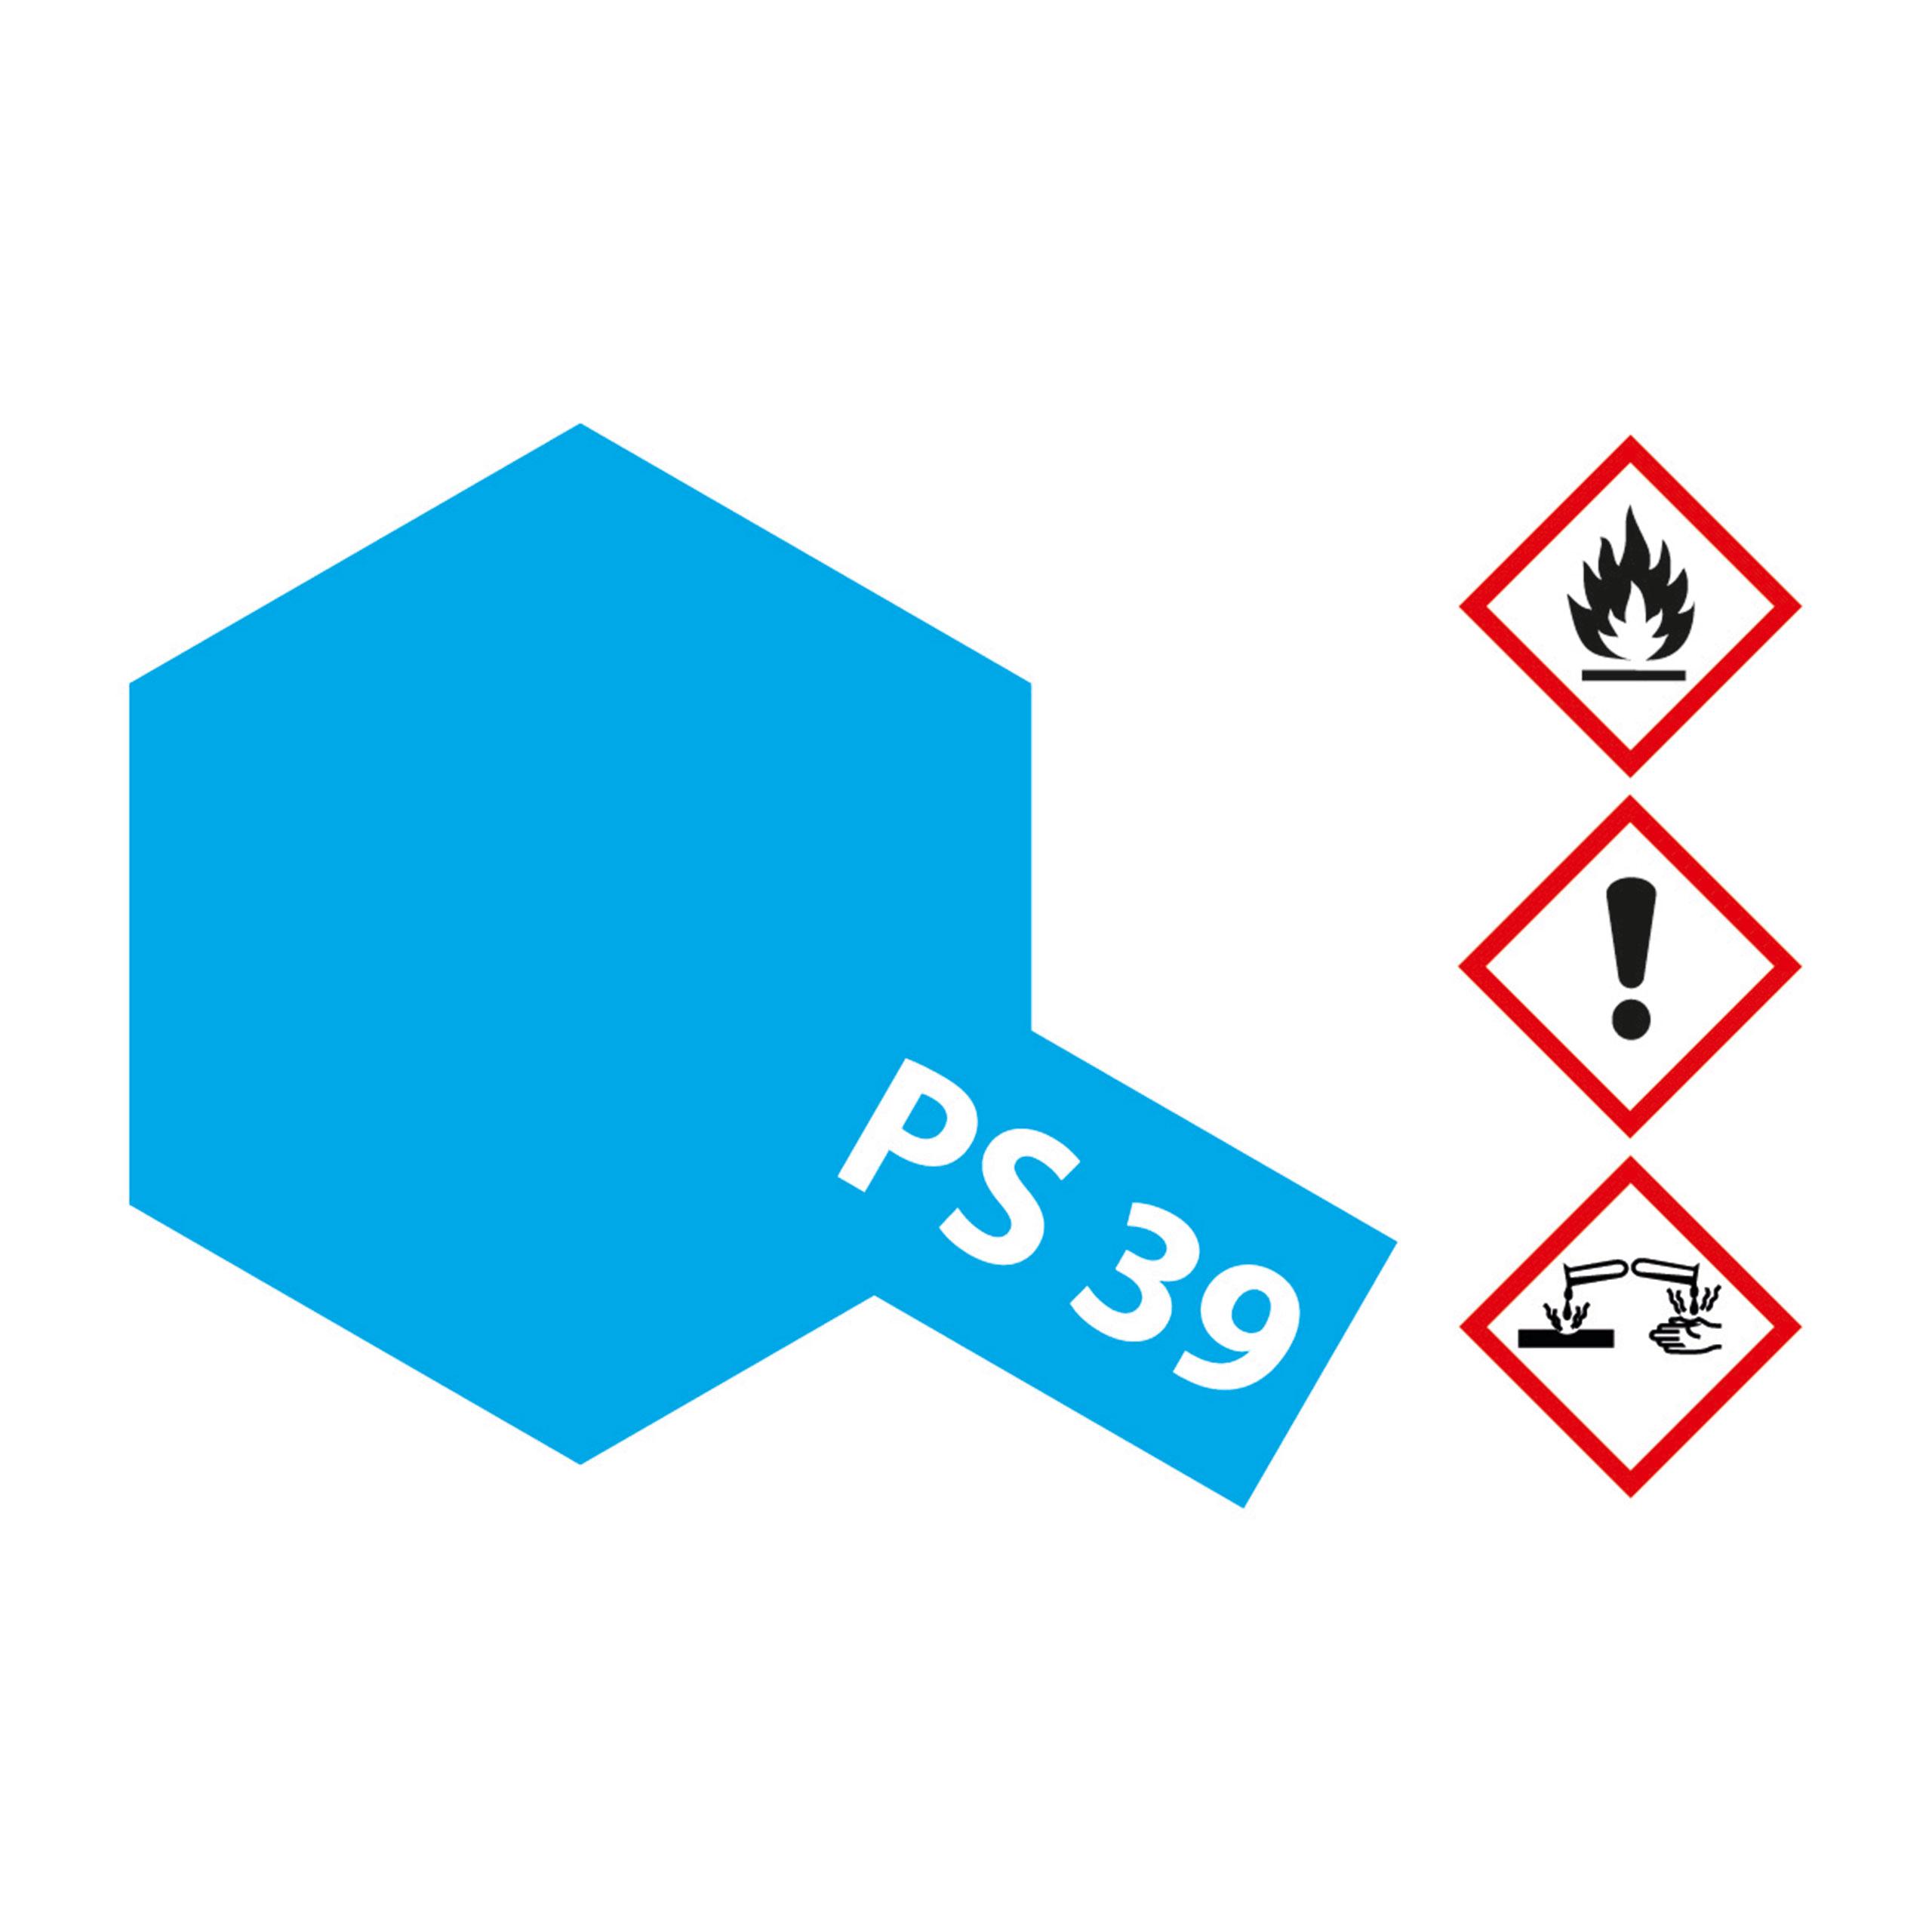 PS-39 Translucent Hellblau Polyc. - 100ml Sprayfarbe Lexan - Tamiya 300086039